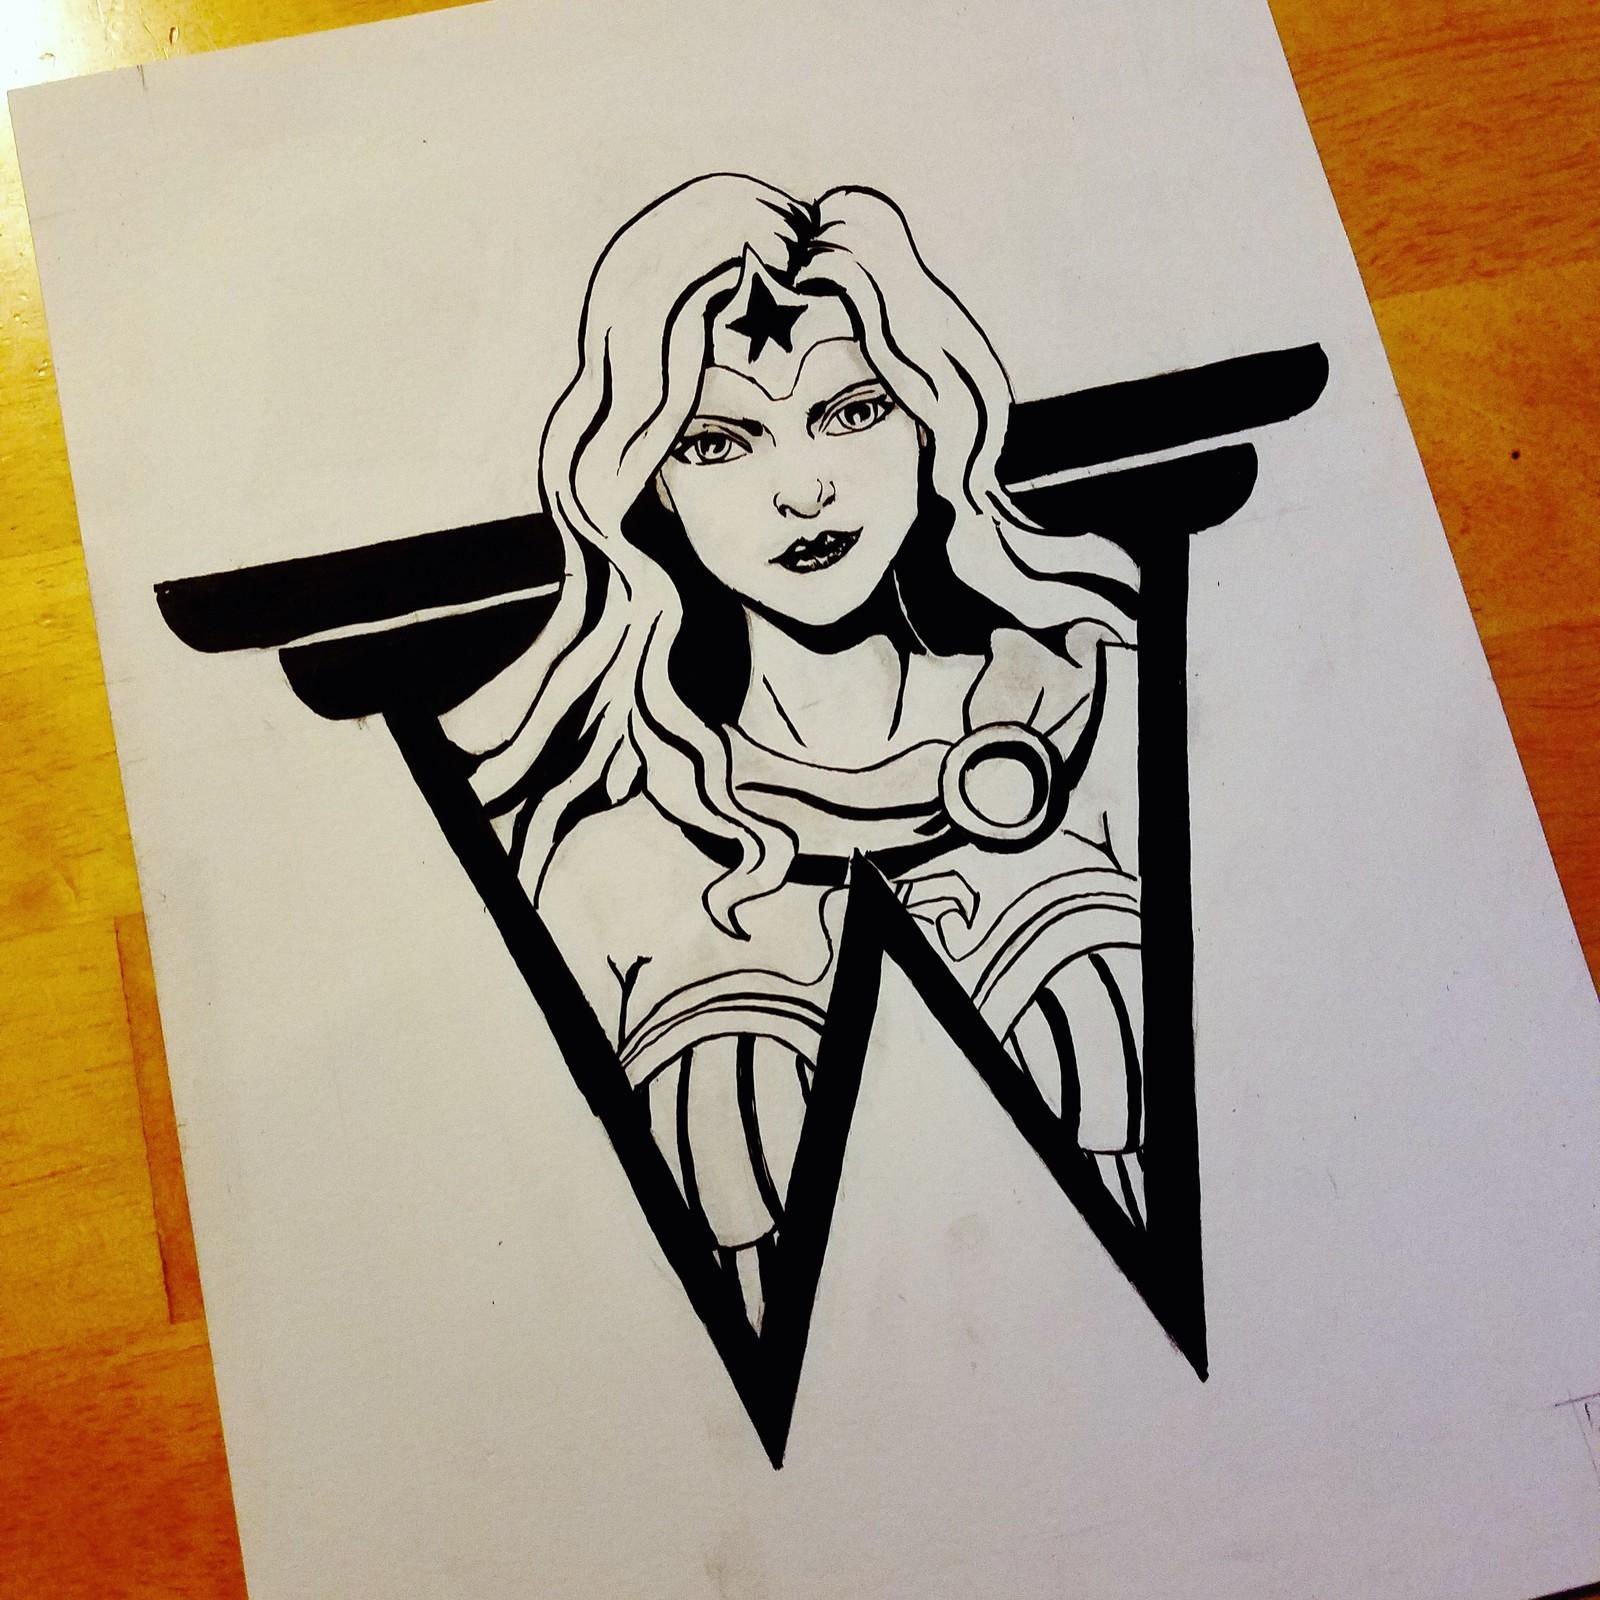 Wonder Woman (Inktober Day 14: Fierce)